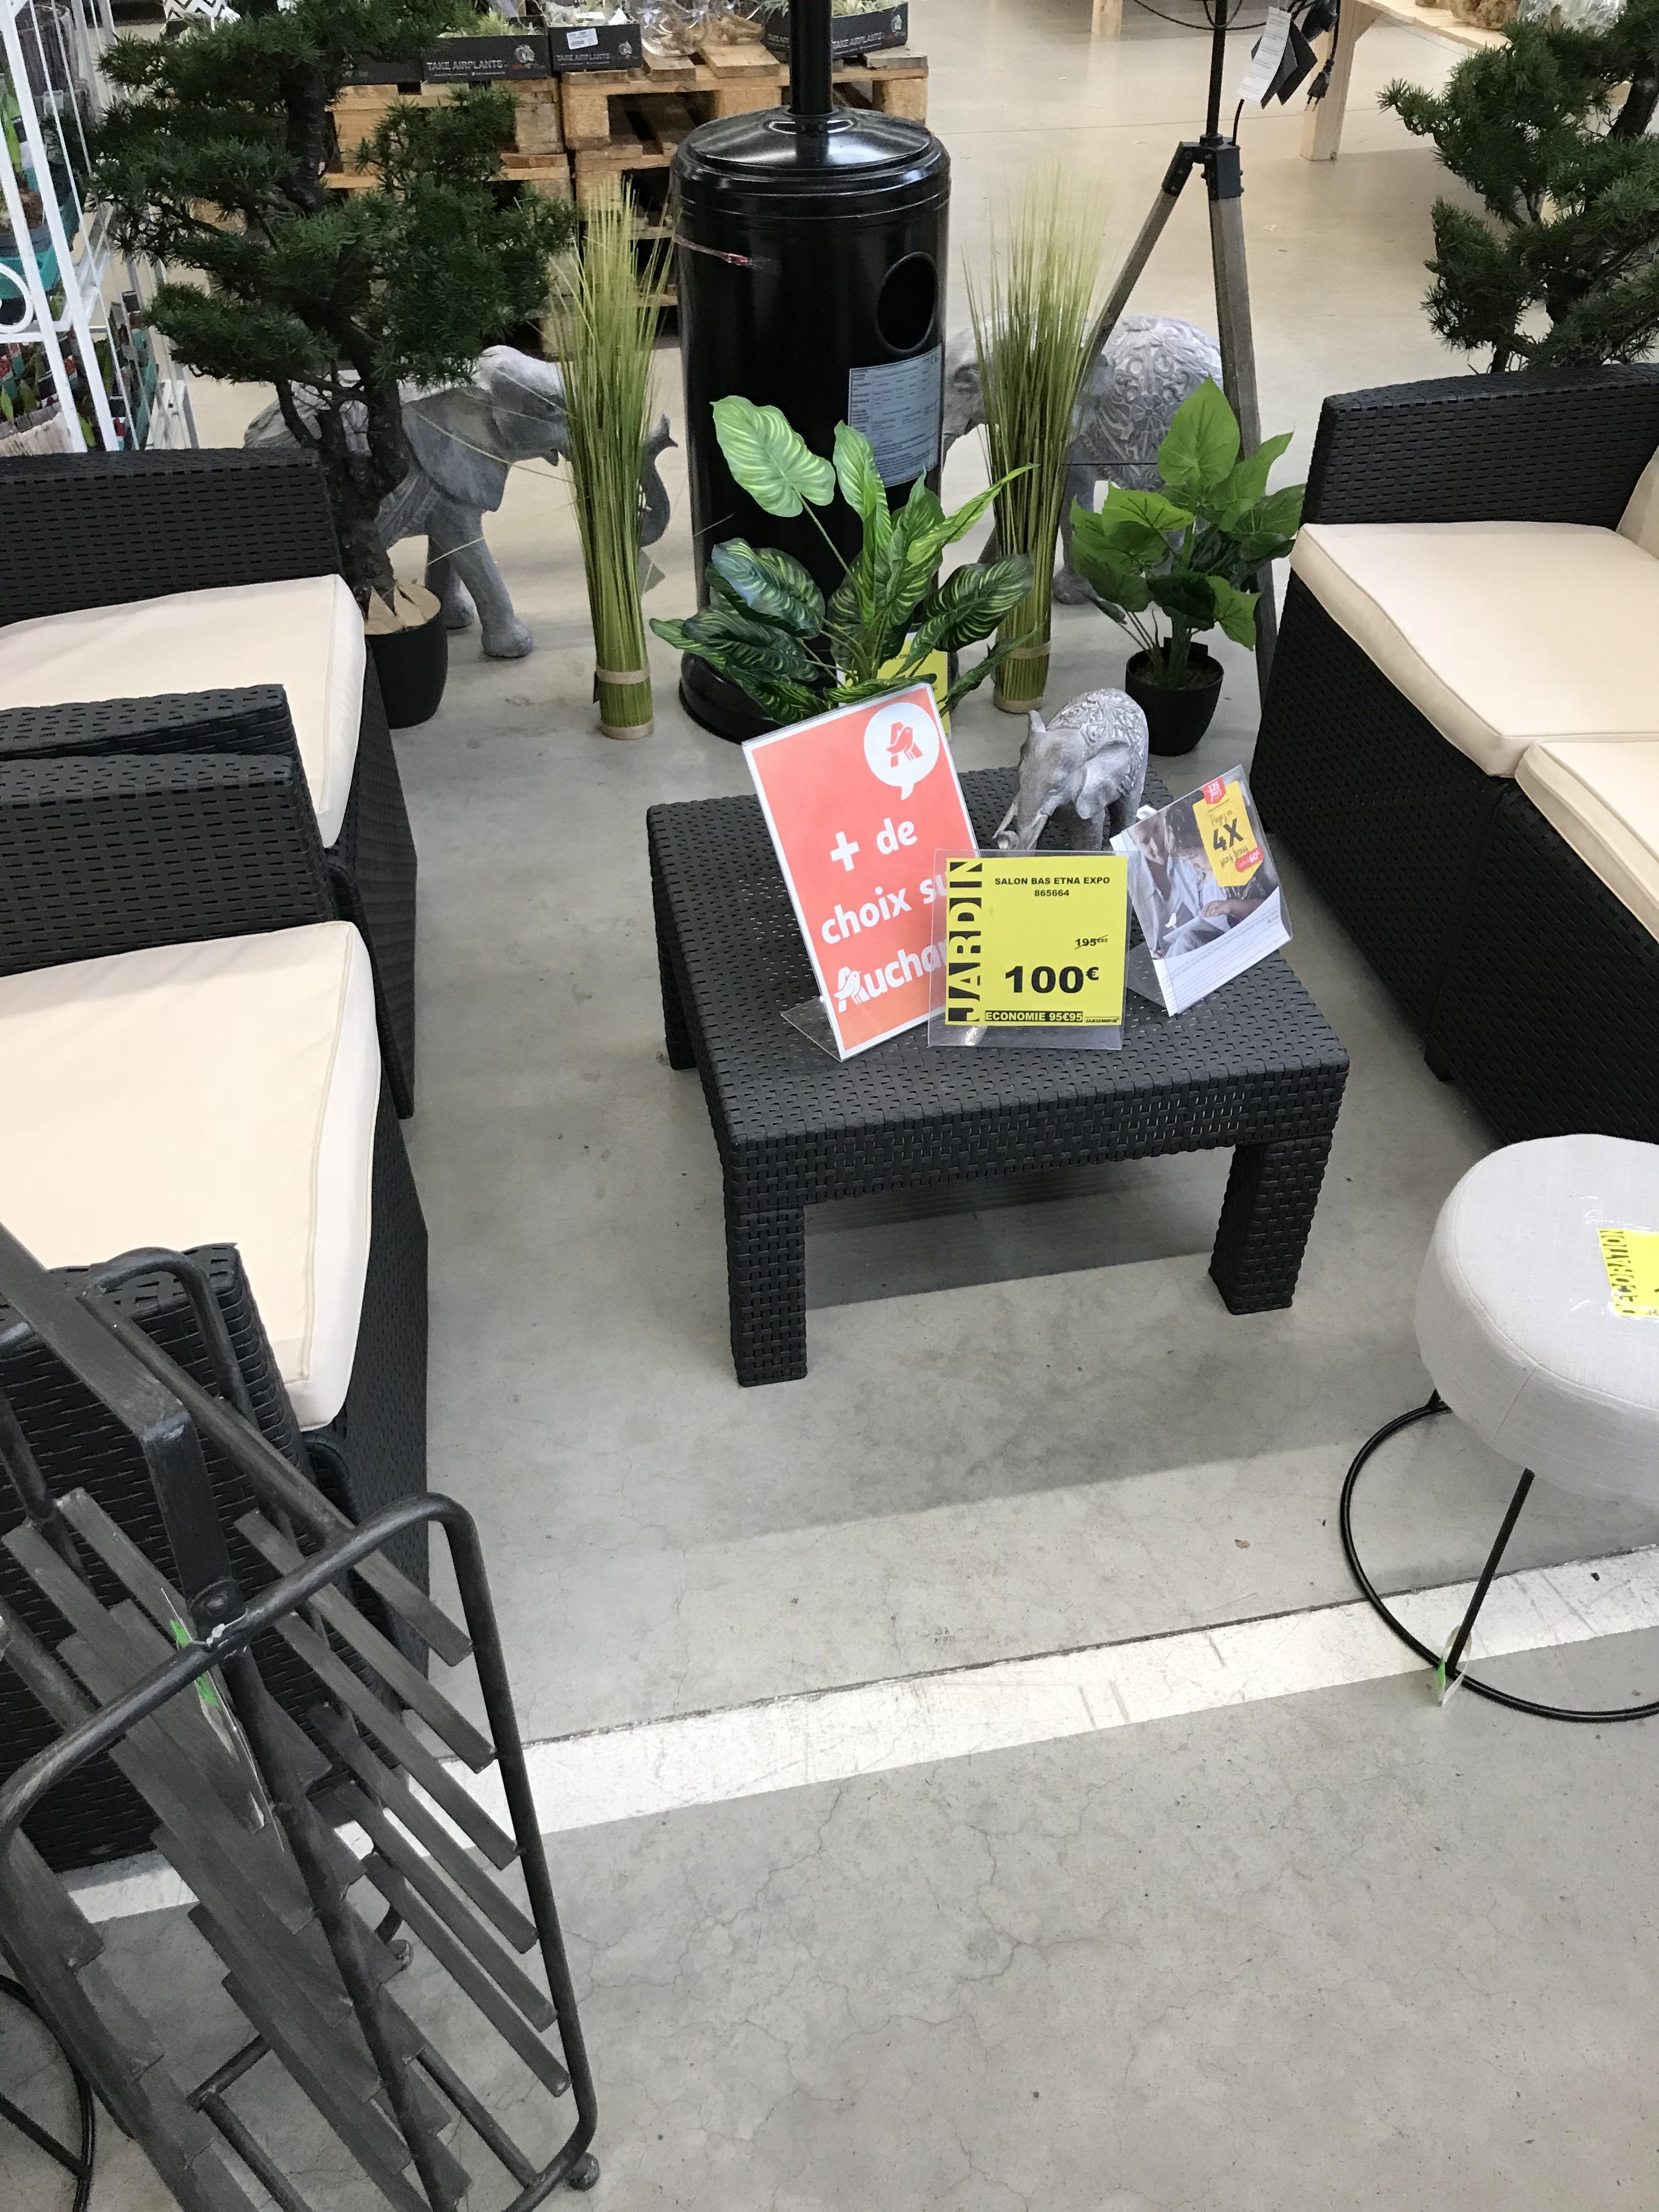 Salon de jardin Etna - Auchan Calais (62)